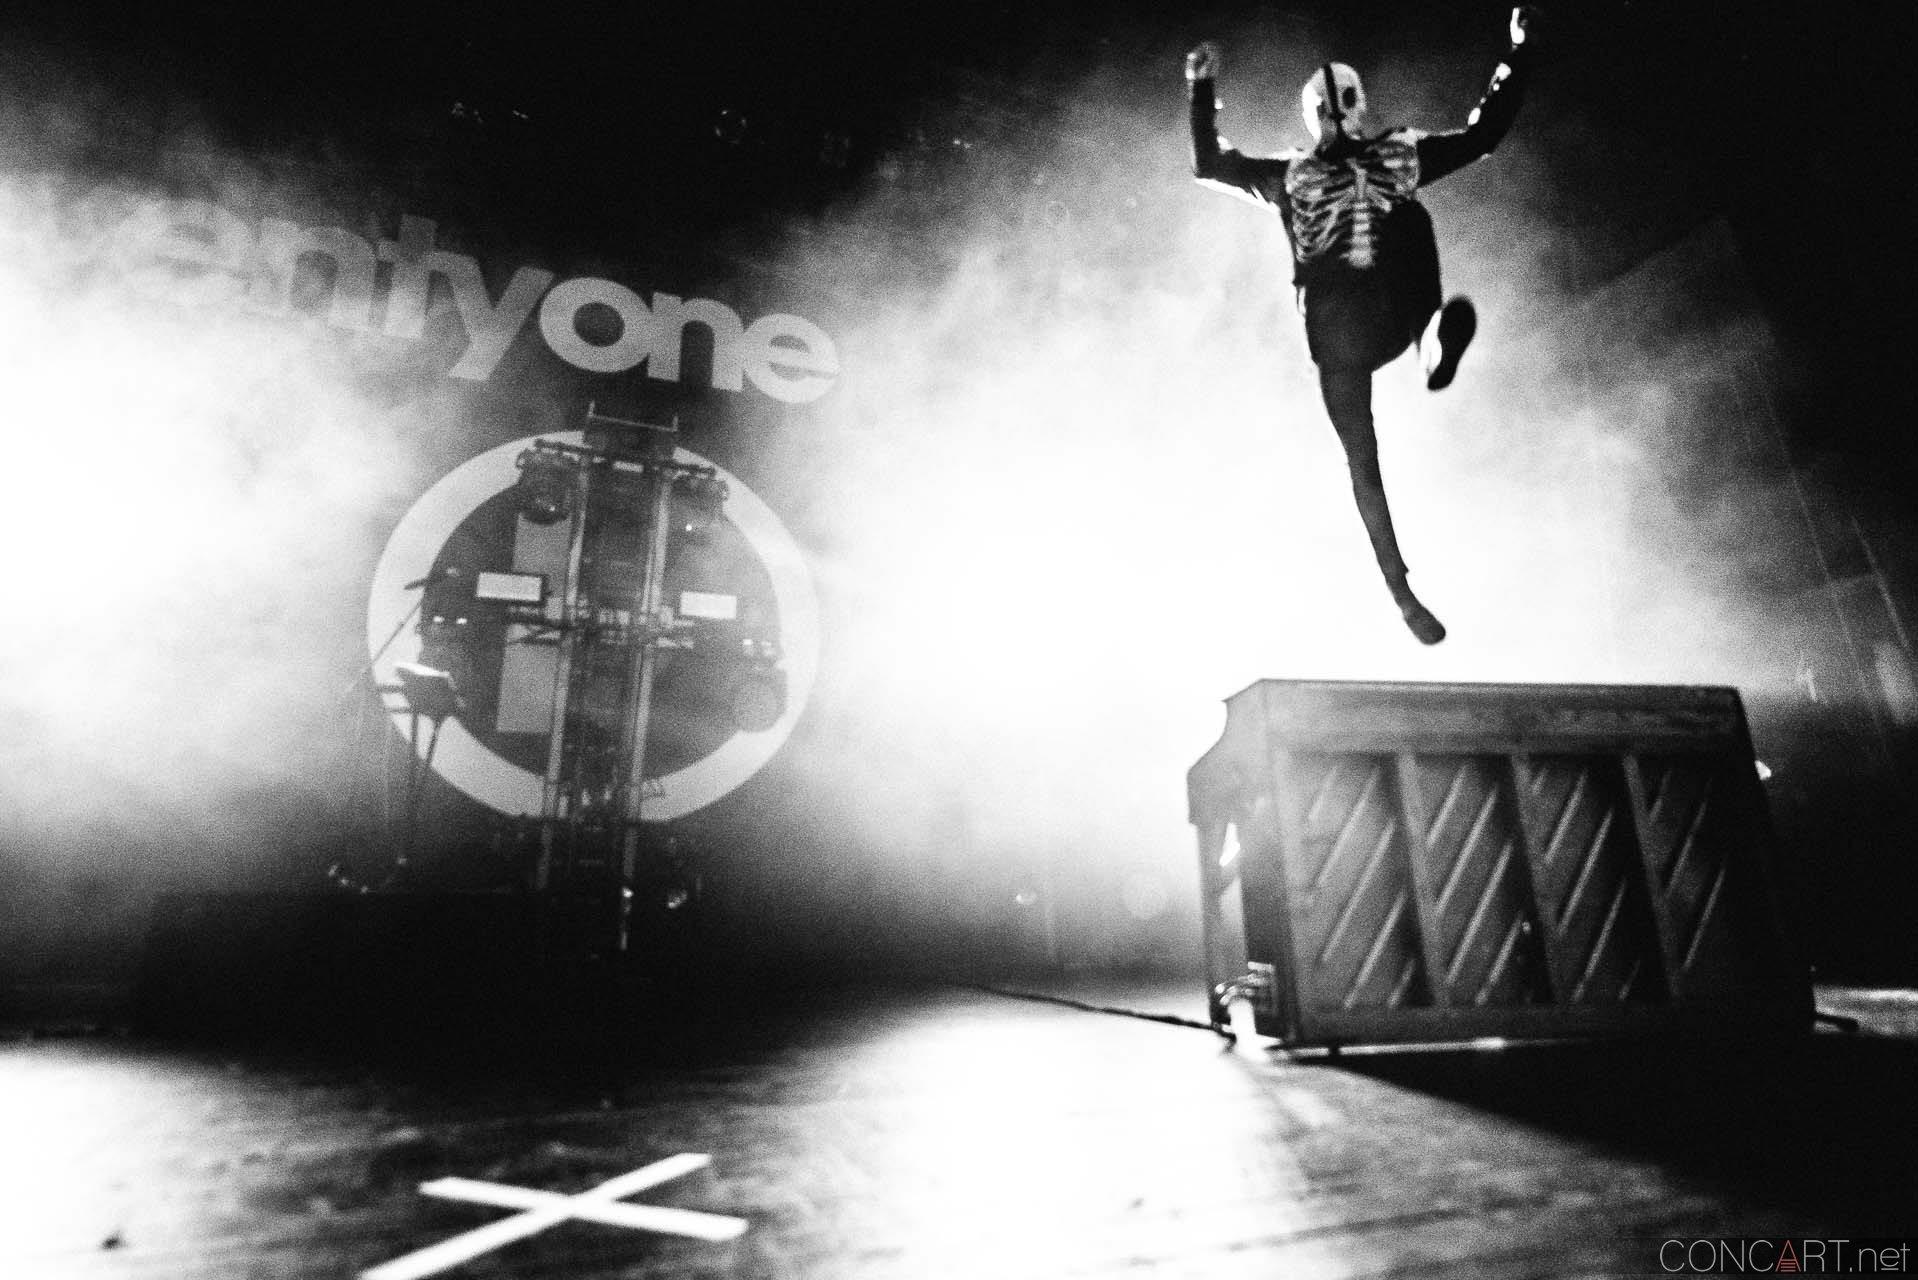 Twenty One Pilots photo by Sean Molin 17